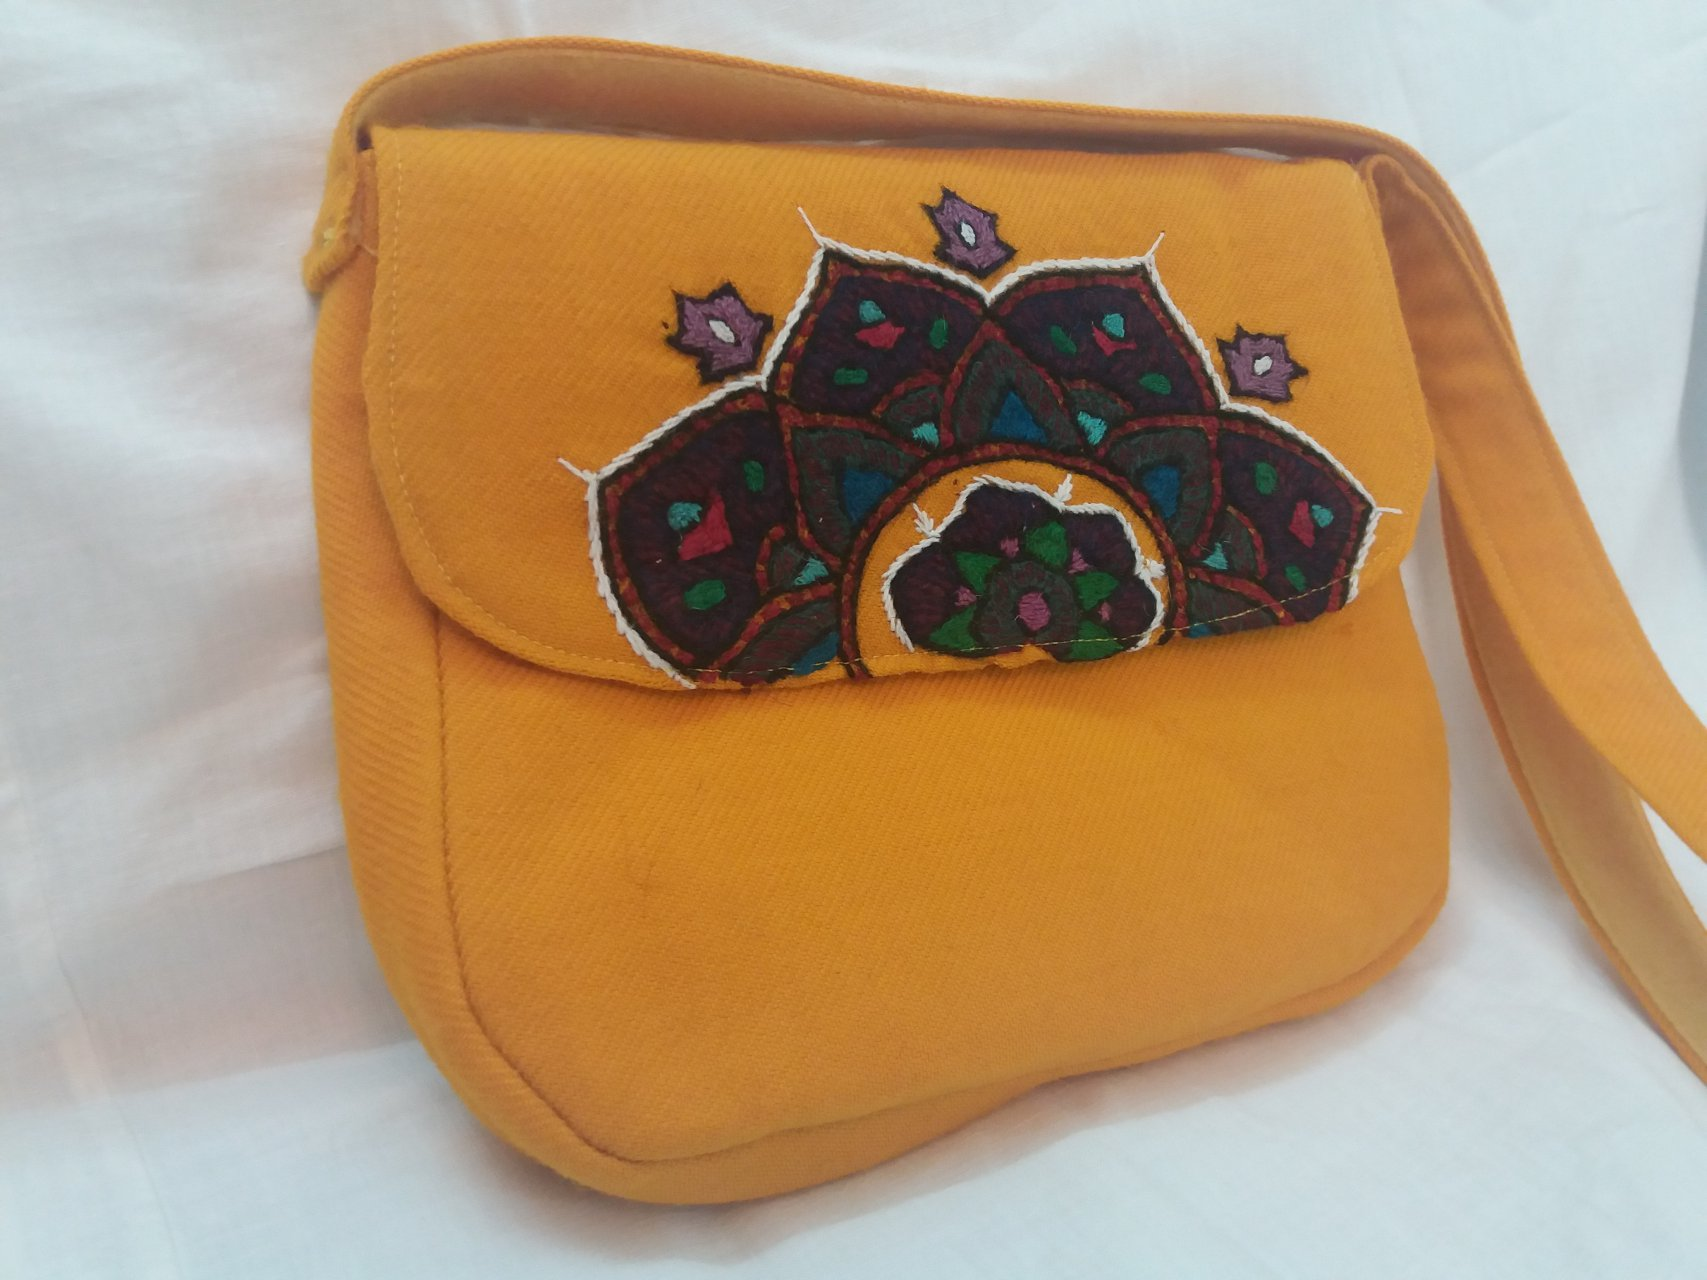 کیف زنانه رنگ زرد پته طرح ترنج